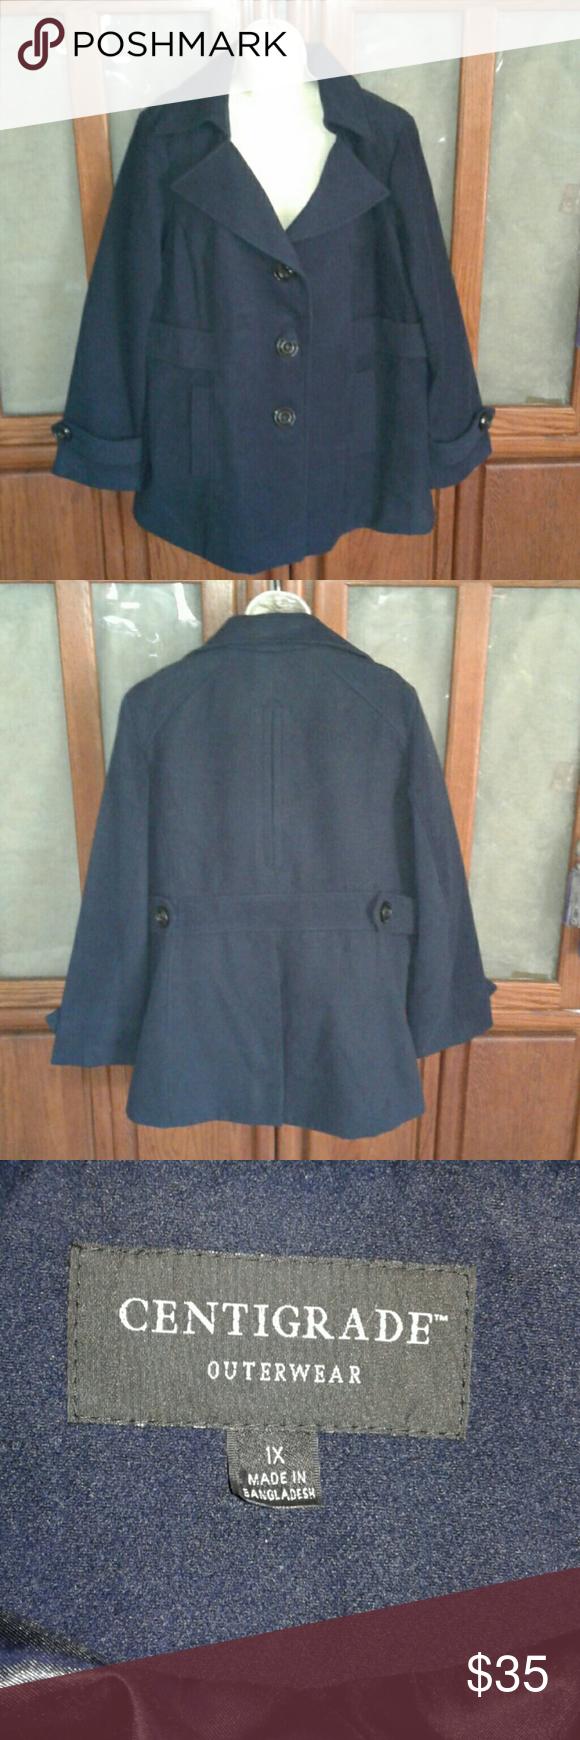 Centigrade Outerwear Navy Blue Car Coat Clothes Design Outerwear Outerwear Jackets [ 1740 x 580 Pixel ]